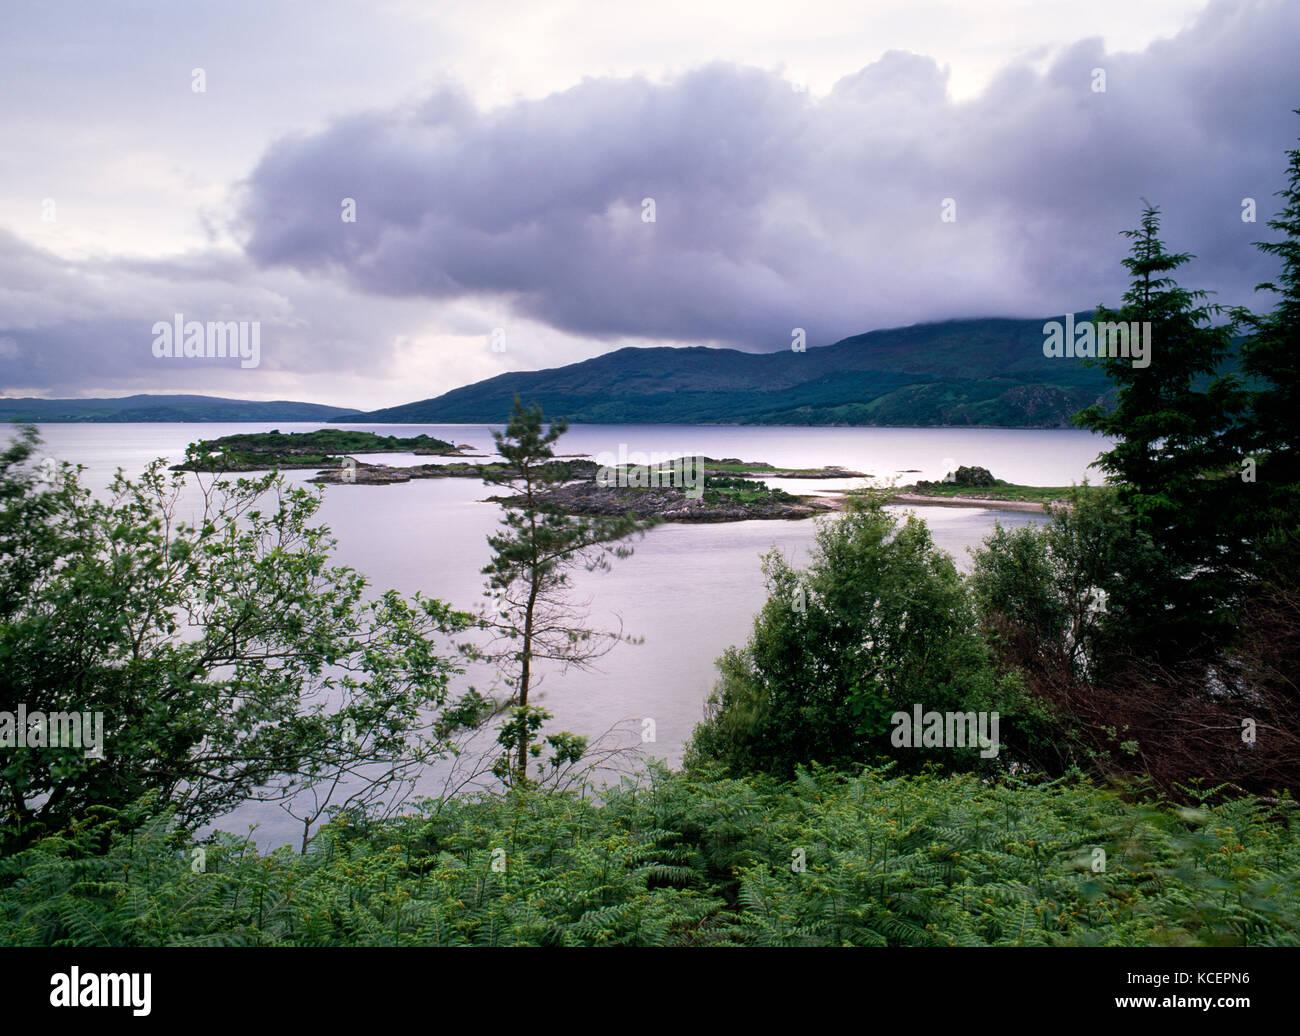 View from track down to Sandaig cottage, near Glen Elg, Lochalsh, Scotland. Eileen More & Loch Dal in foreground, Stock Photo